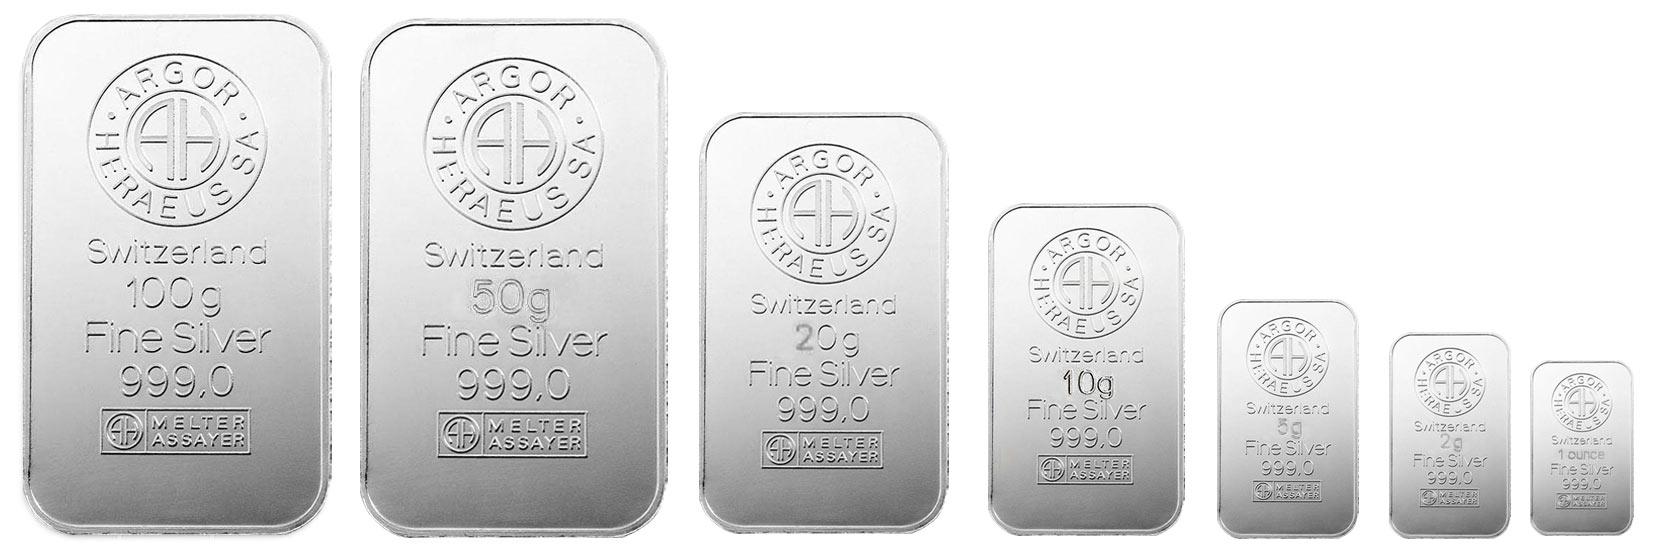 чистое серебро, слитки